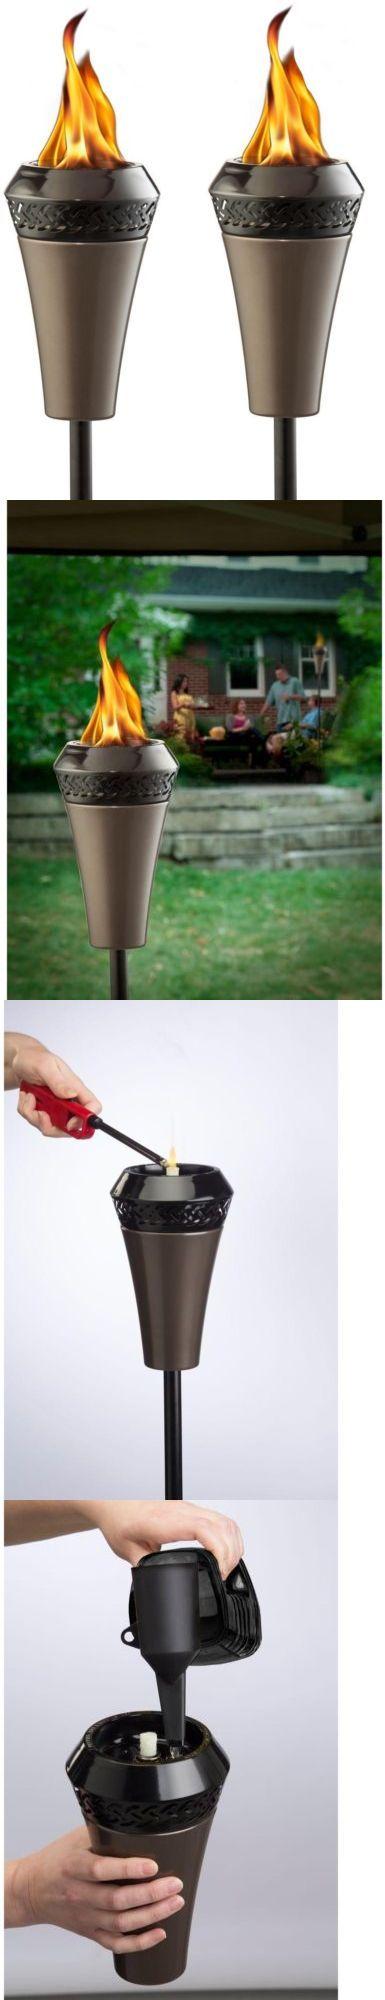 Garden and Patio Torches 183391: Tiki Hawaii Sleek Backyard Gunmetal Island King Kerosene Torch Bundle (2-Pack) -> BUY IT NOW ONLY: $51.5 on eBay!